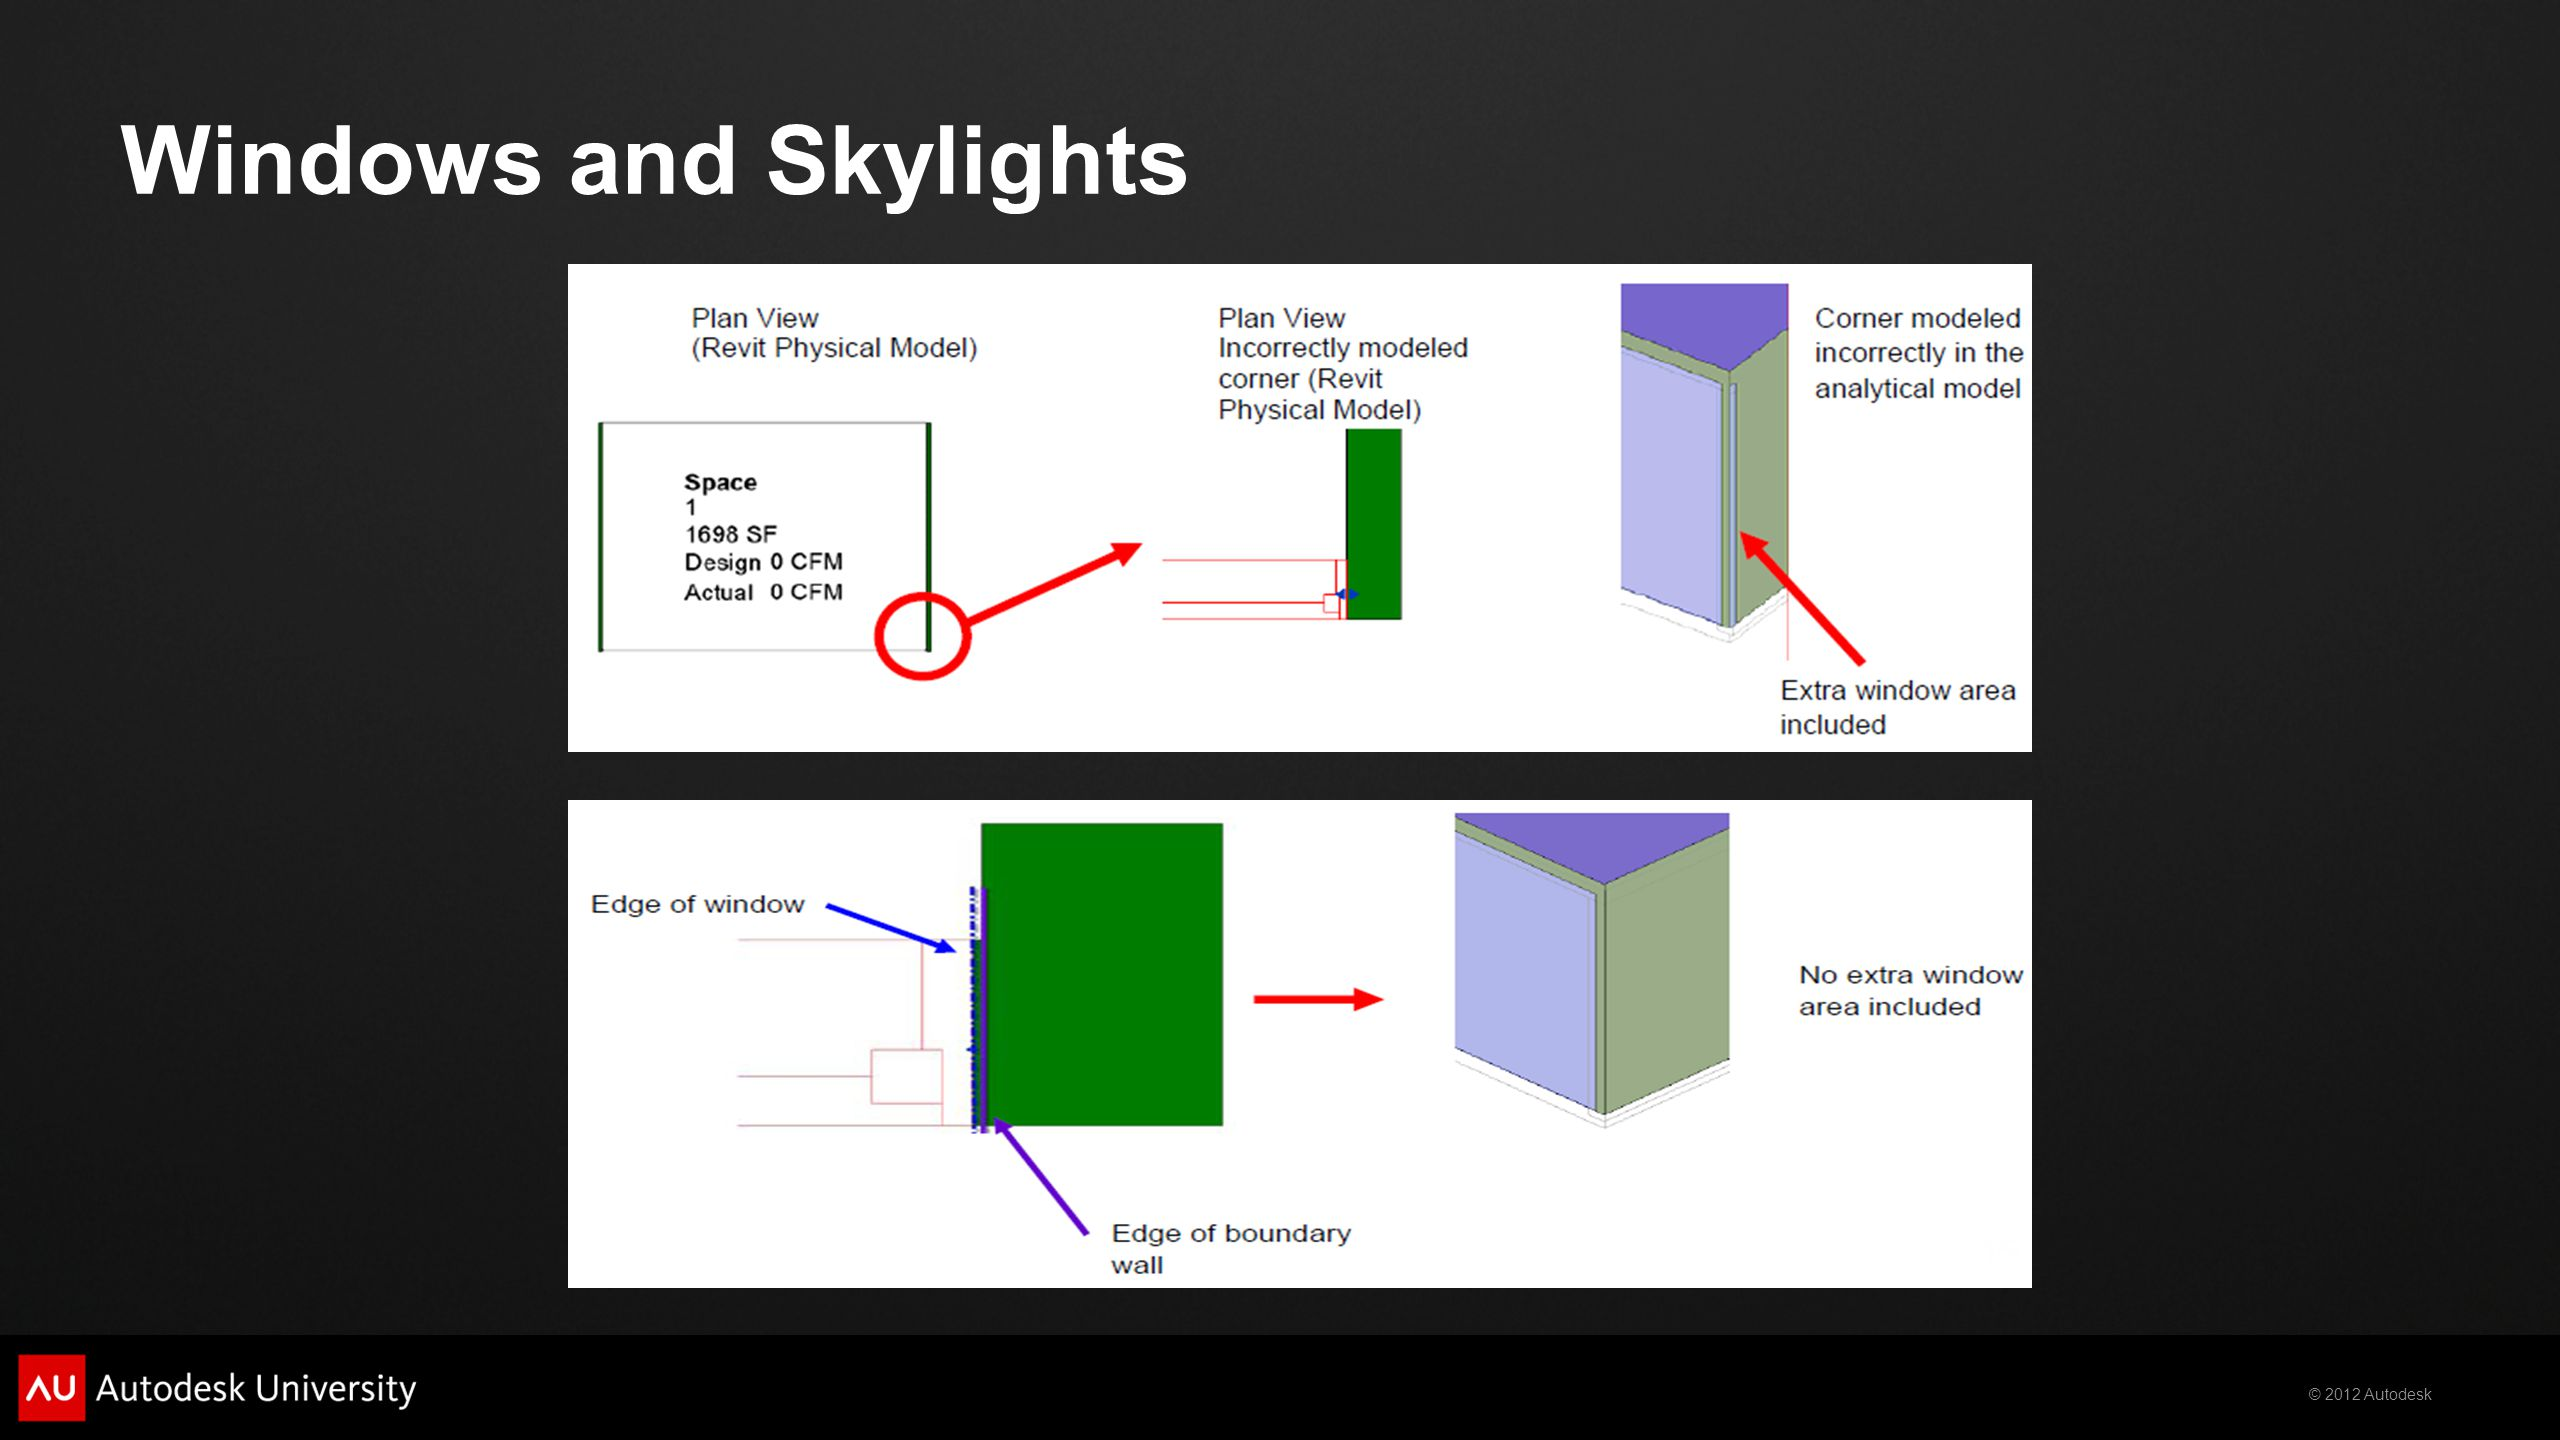 Windows and Skylights